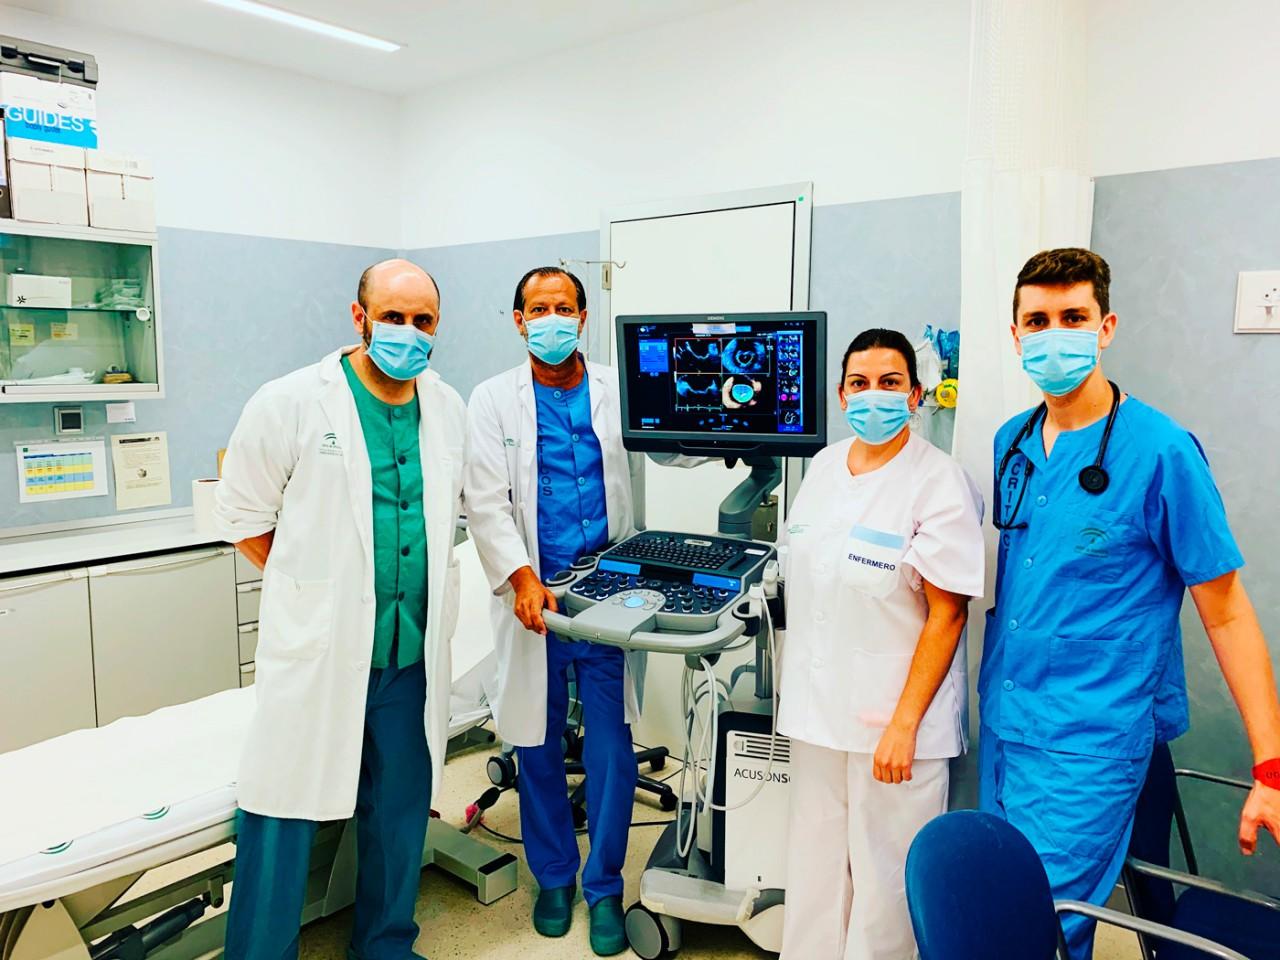 Unidad_Imagem_Cardiaca_Hospital_Clinico_Universitario